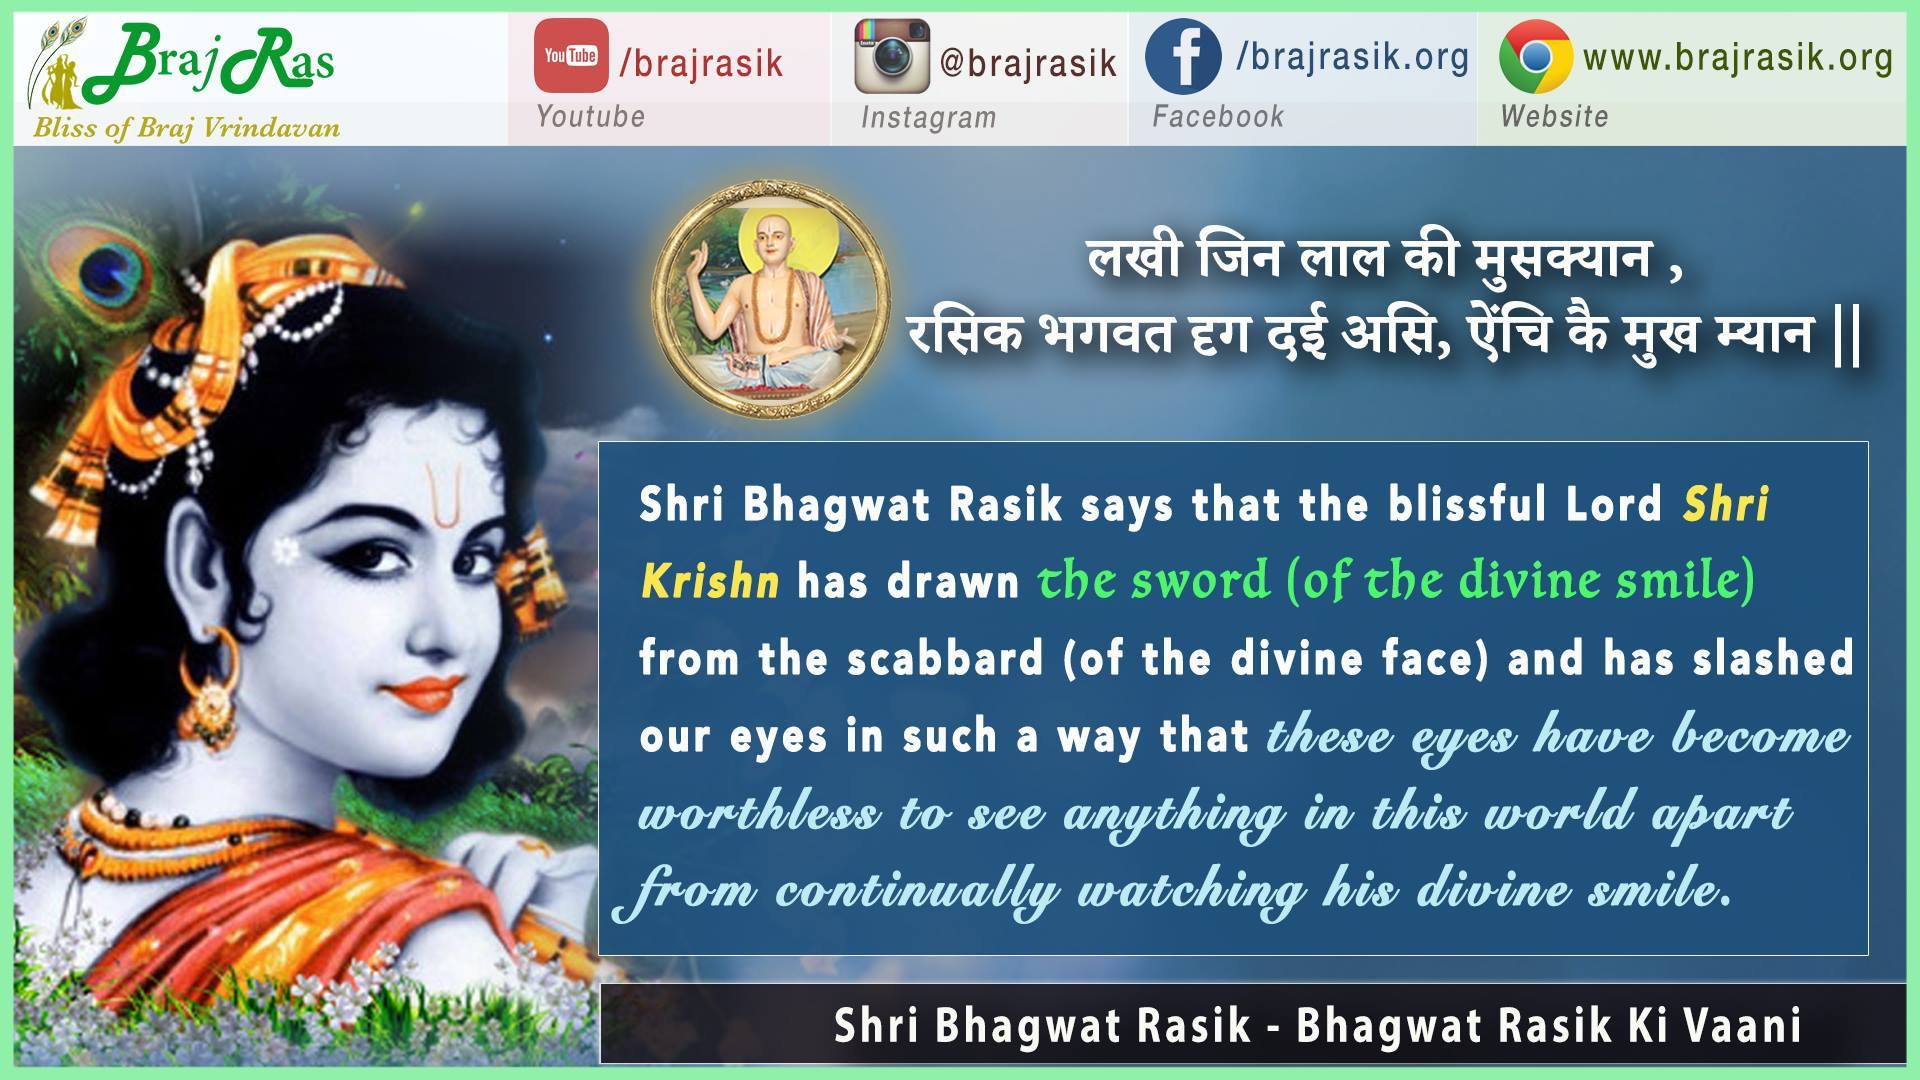 Lakhi Jin Laal Ki Muskaan - Shri Bhagwat Rasik - Bhagwat Rasik Ki Vaani